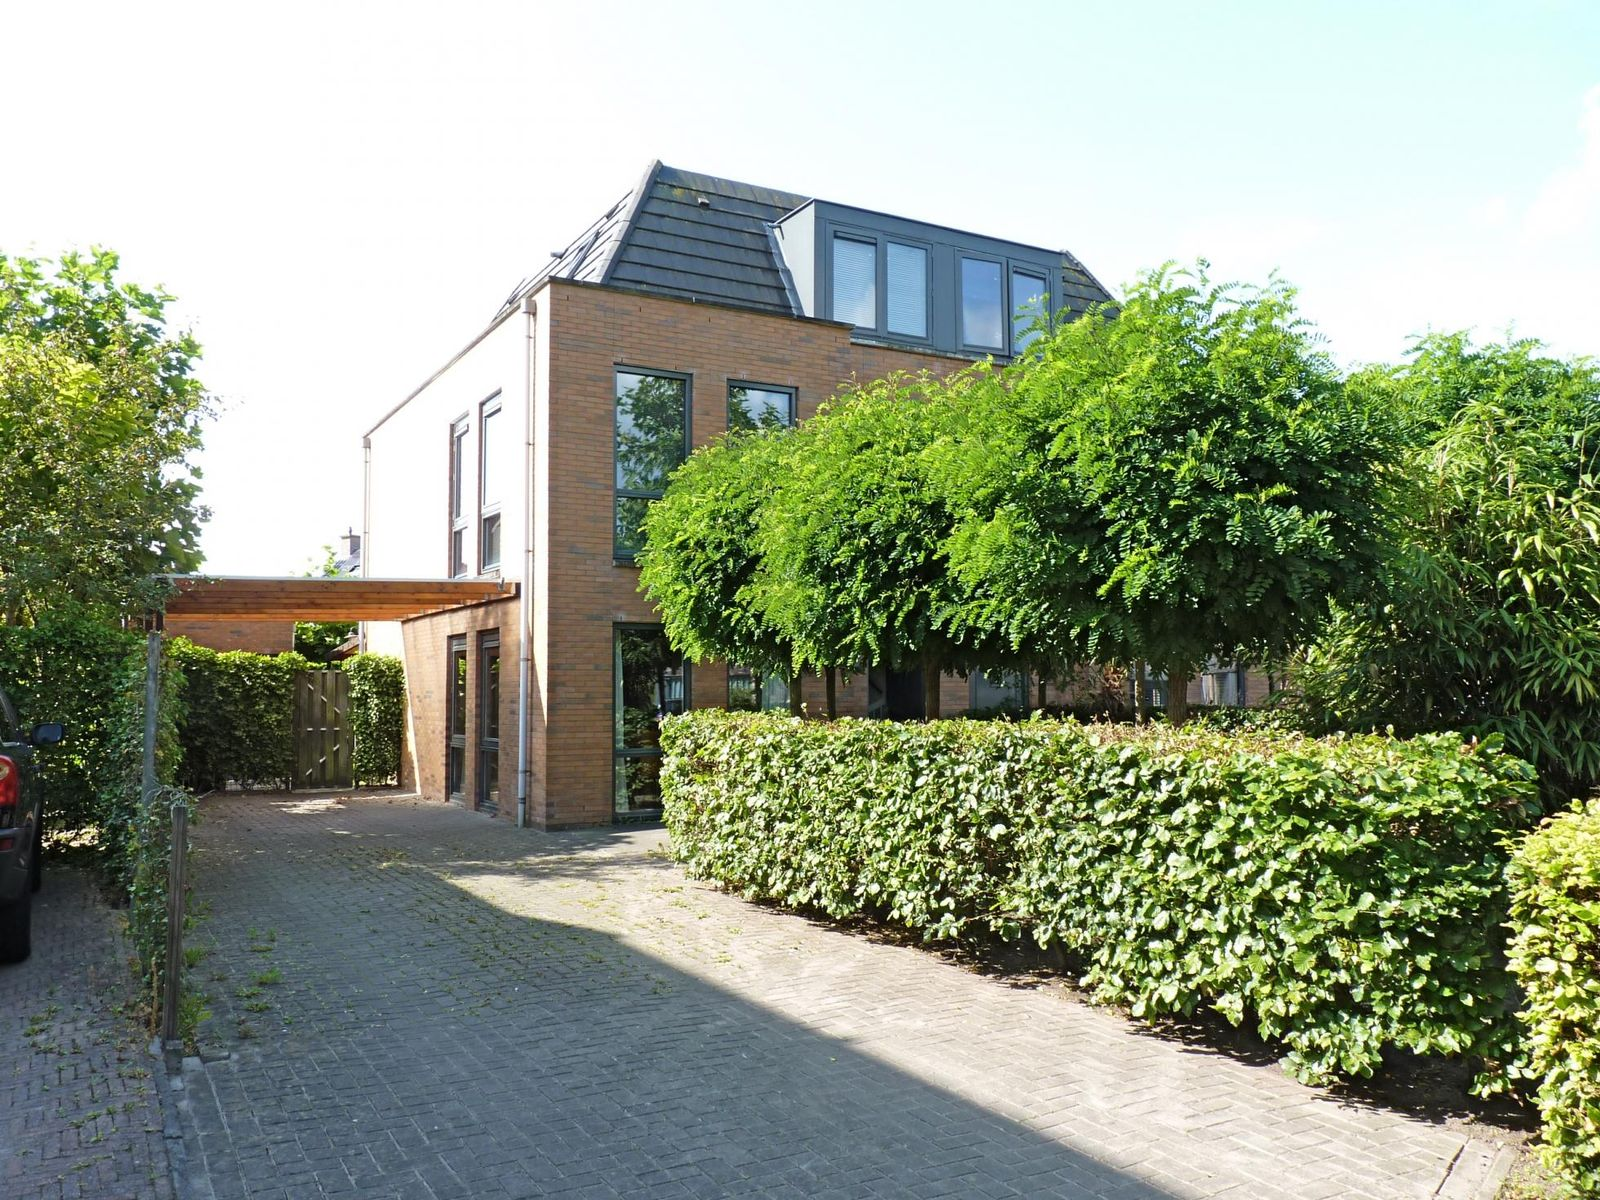 Grasland 106, Drachten